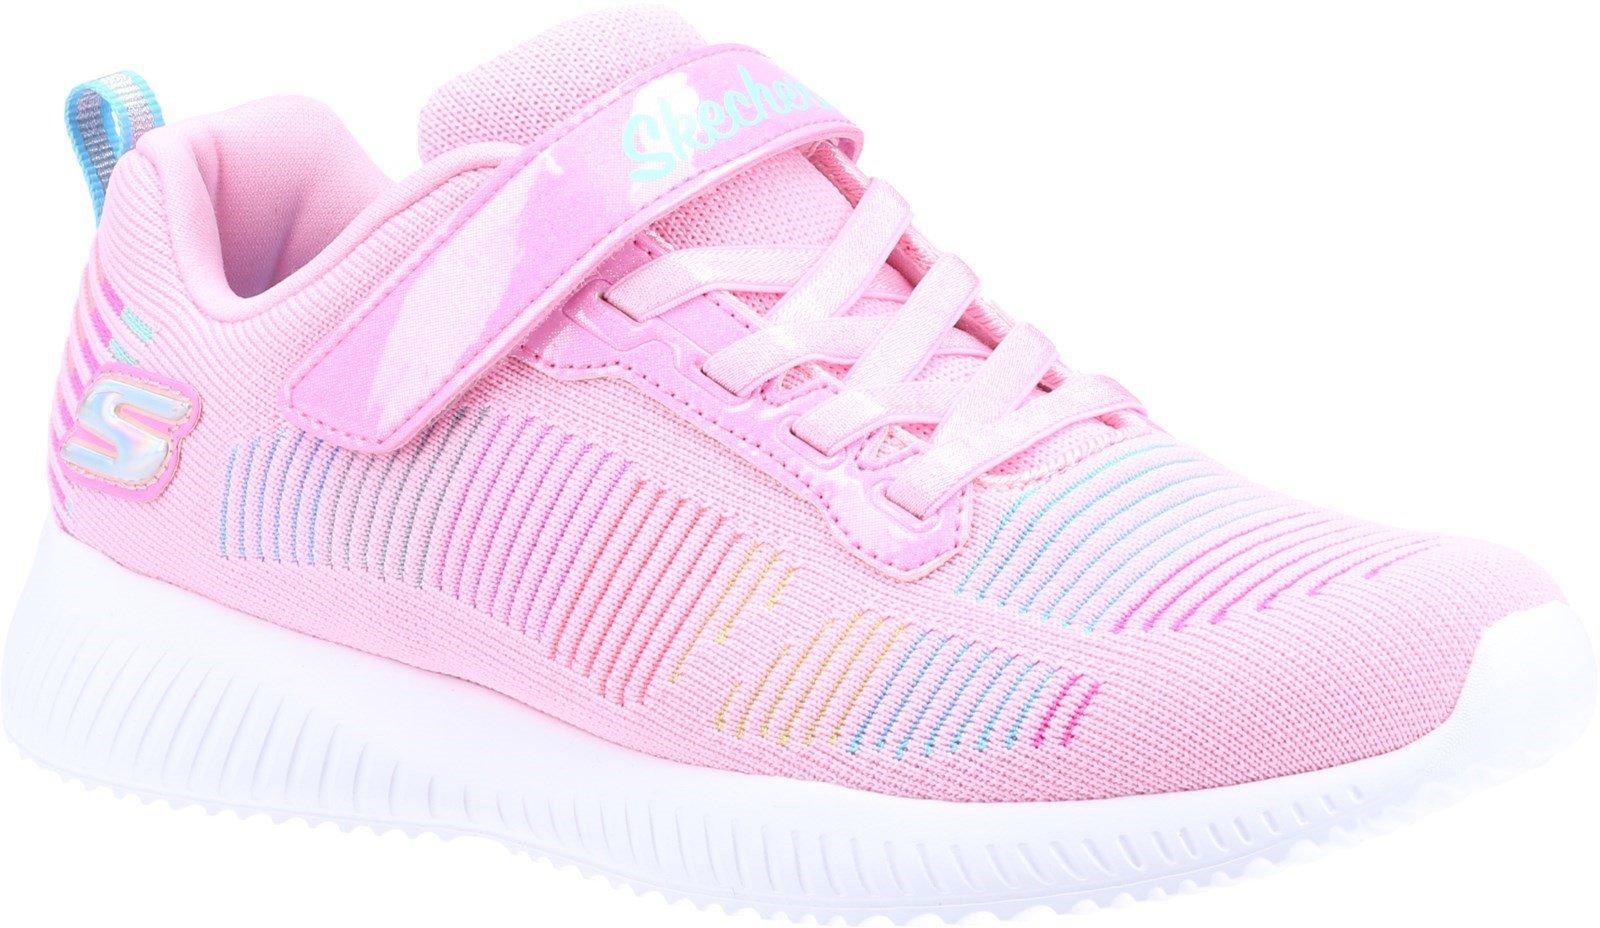 Skechers Kid's Bobs Squad Fresh Delight Sports Trainer Various Colours 32093 - Pink Mesh/Multi Trim 9.5